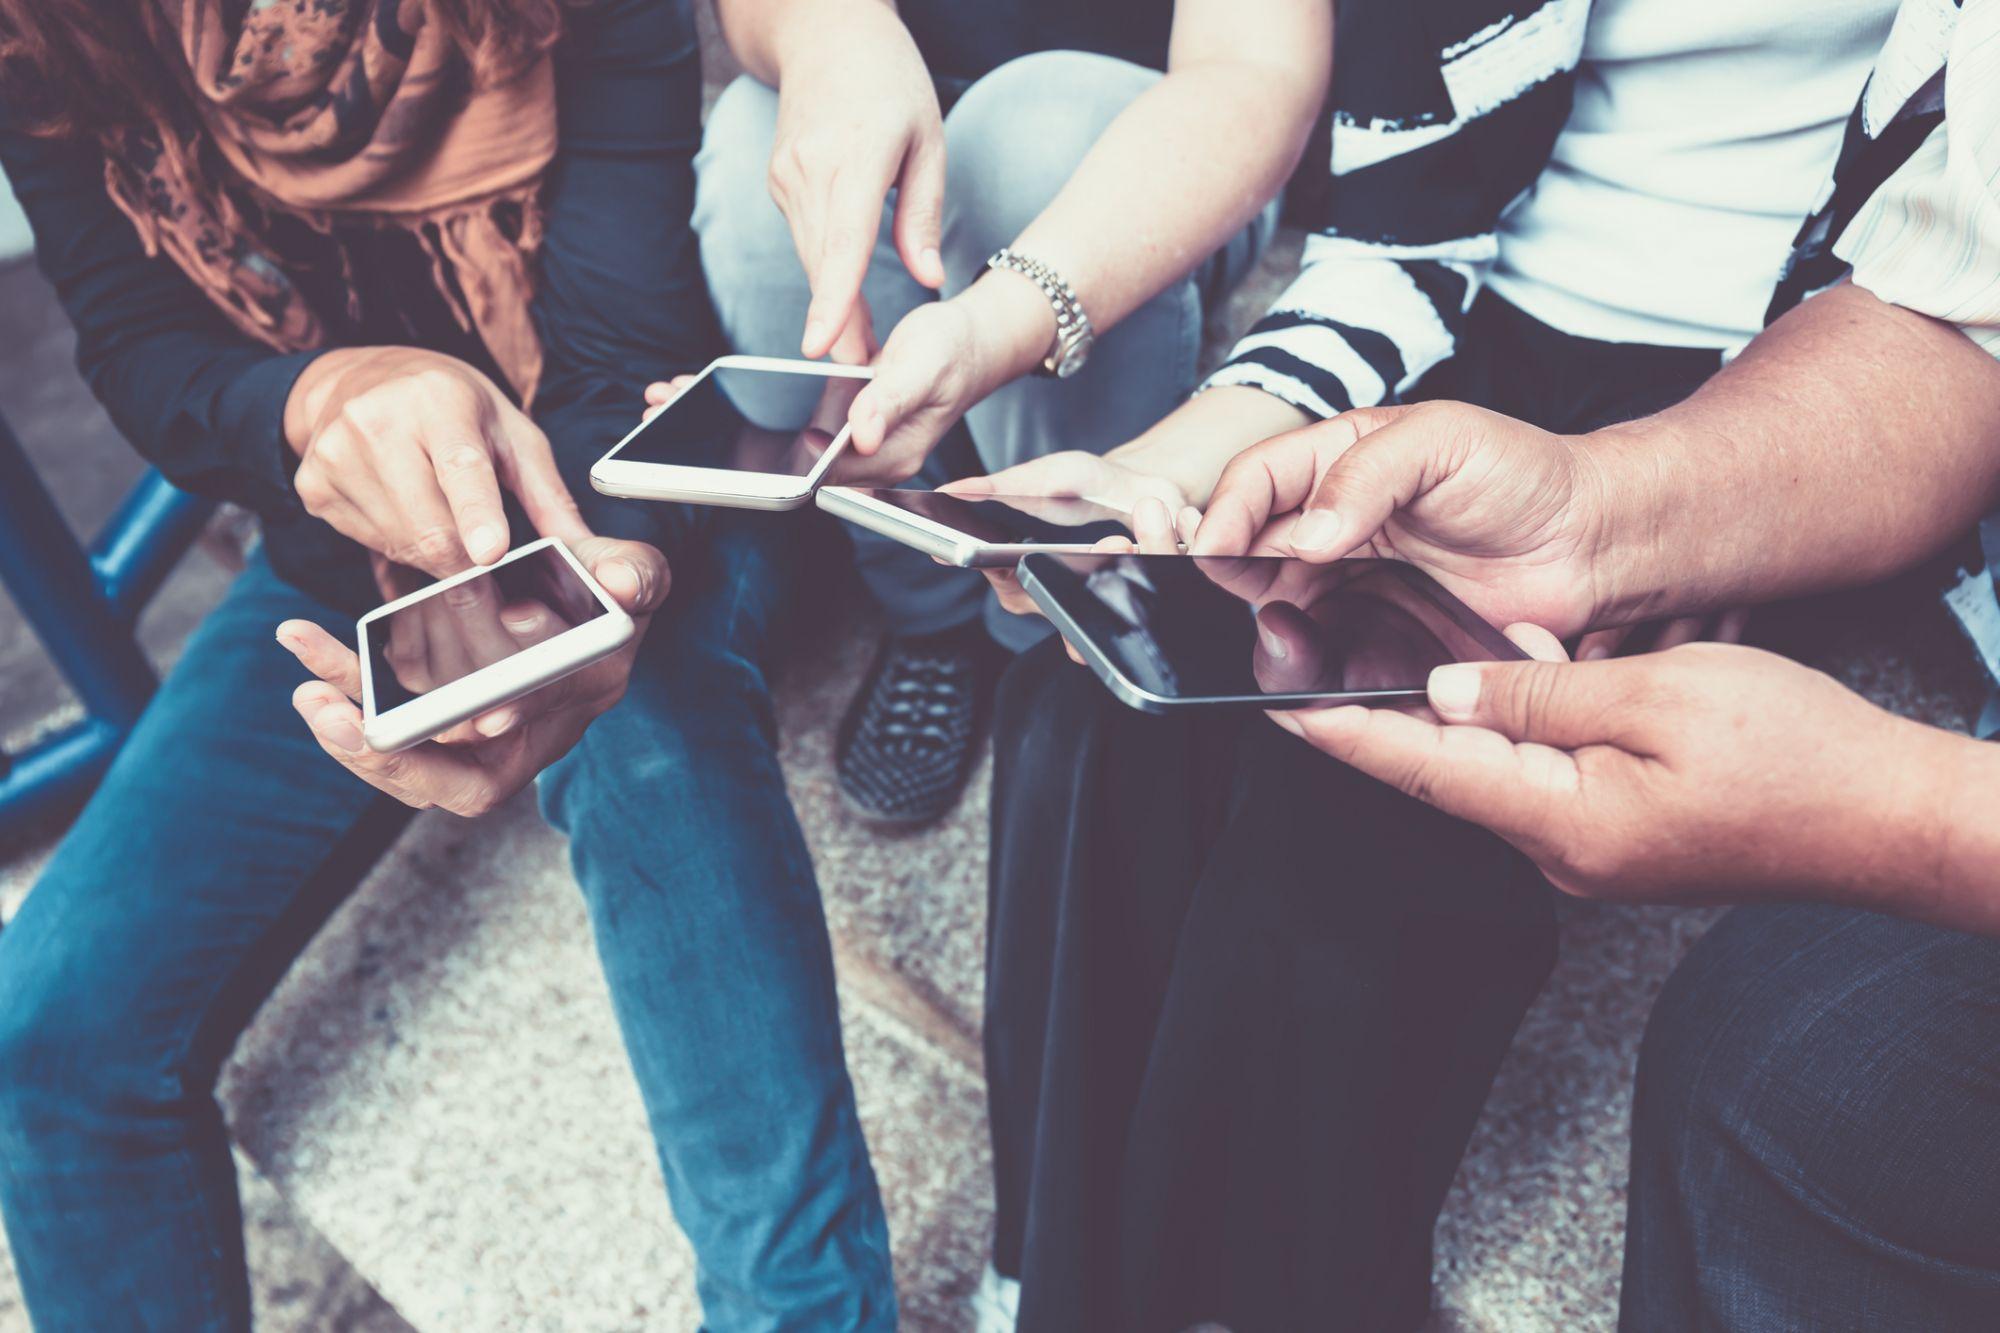 Instagram Engagement Pods -- Should You Use Them?